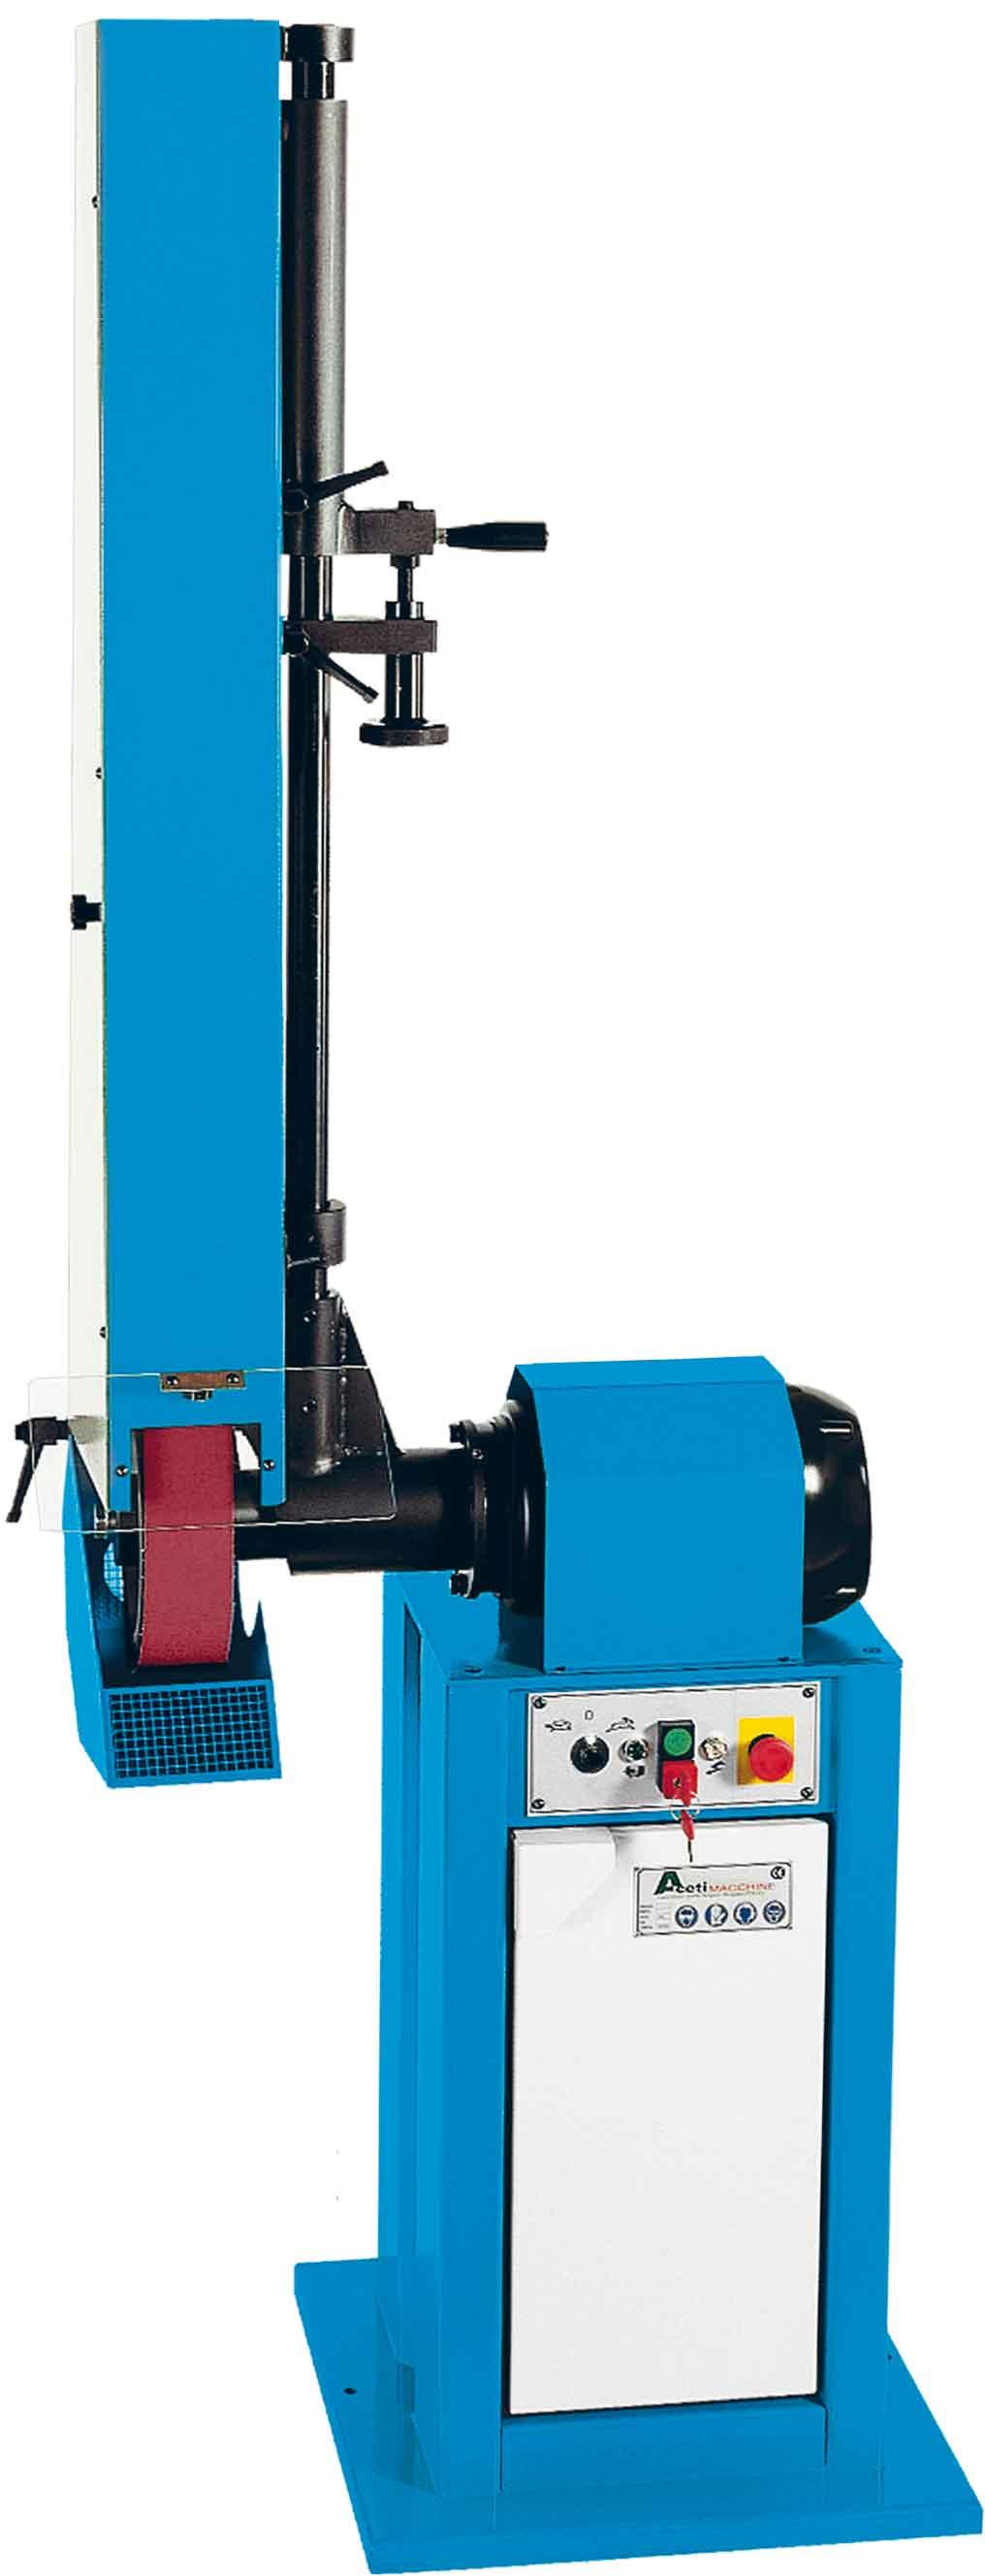 ART.128 - Belt grinding machine